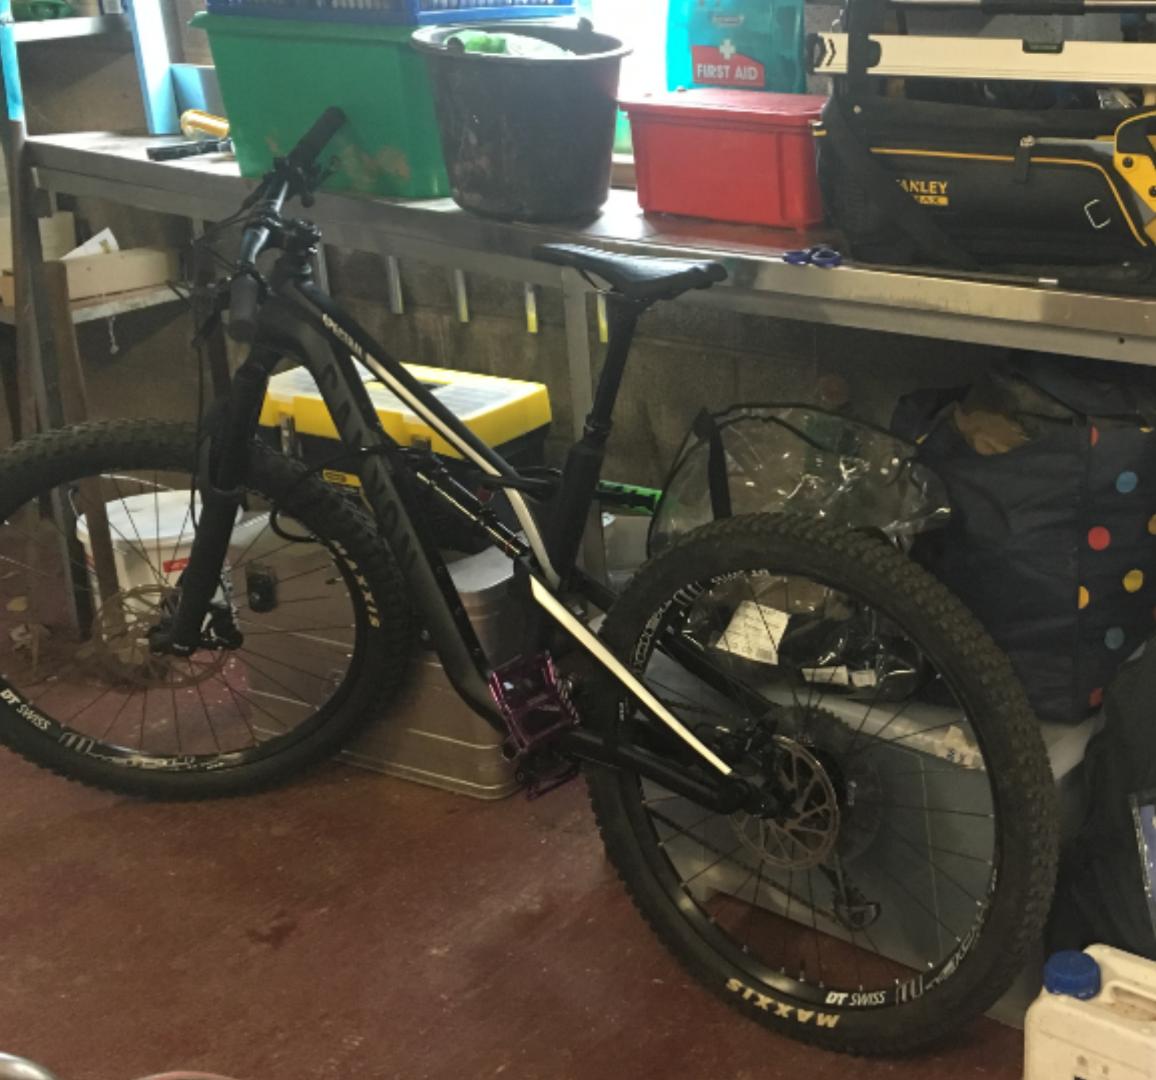 Stolen MTB - bicycles CANYON Spectral AL 6 0 - 2018